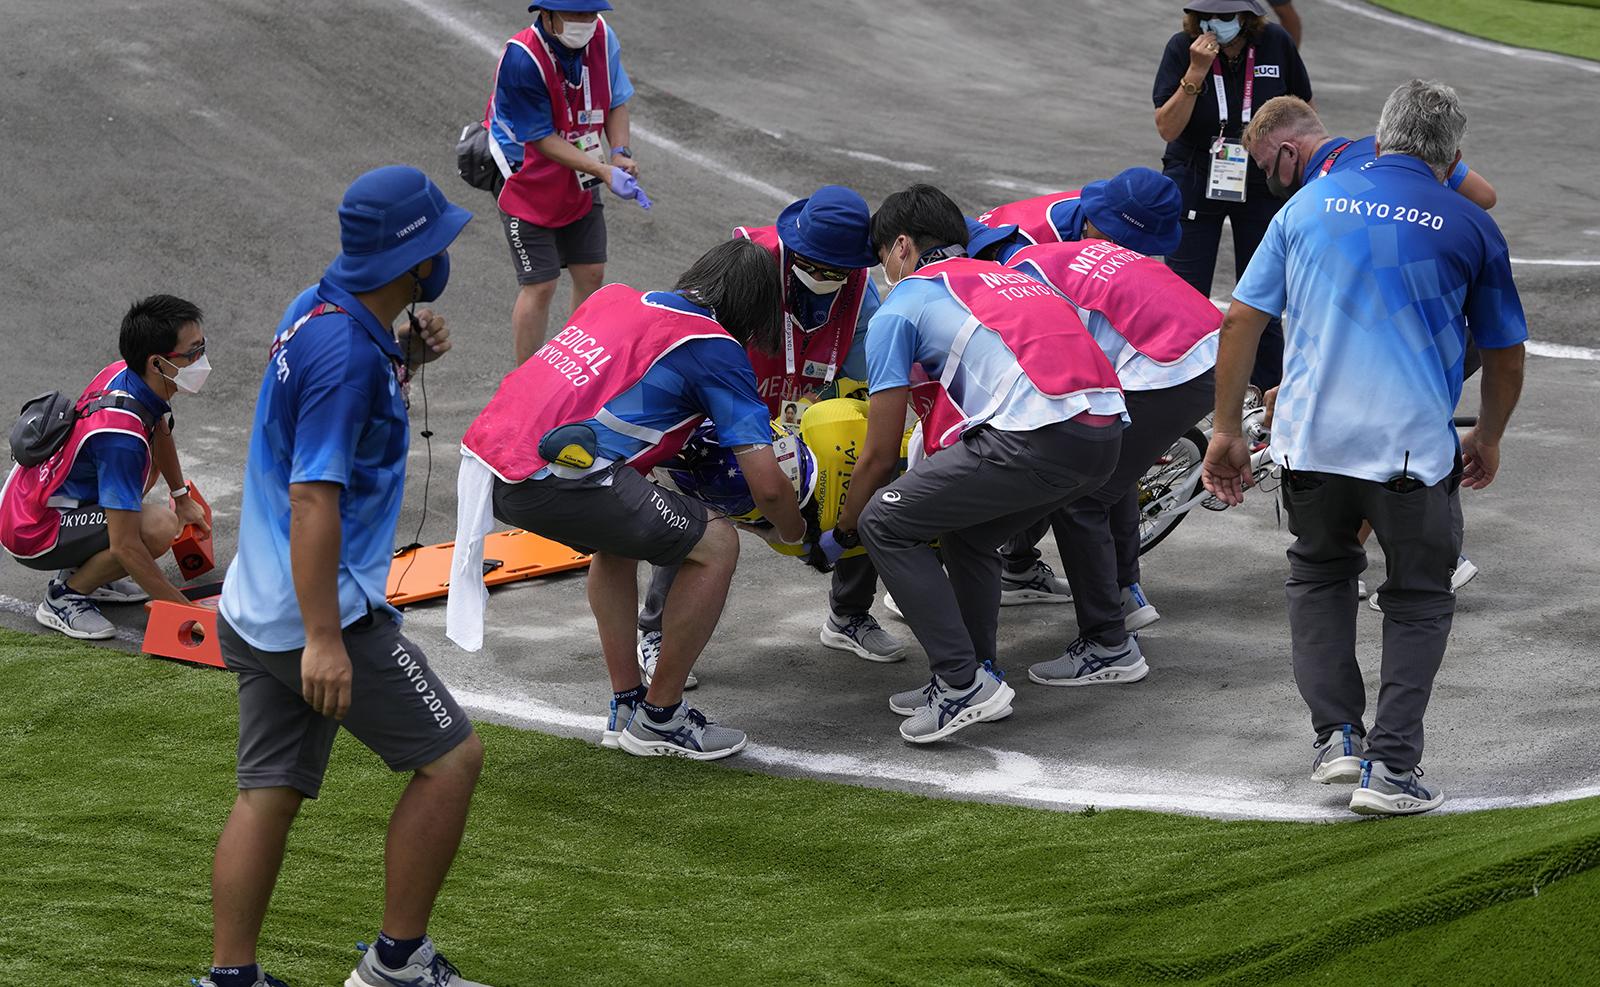 Saya Sakakibara of Australia is stretchered away by medics after crashing in the women's BMX Racing semifinals at the 2020 Summer Olympics, Friday, July 30, 2021, in Tokyo, Japan. AP